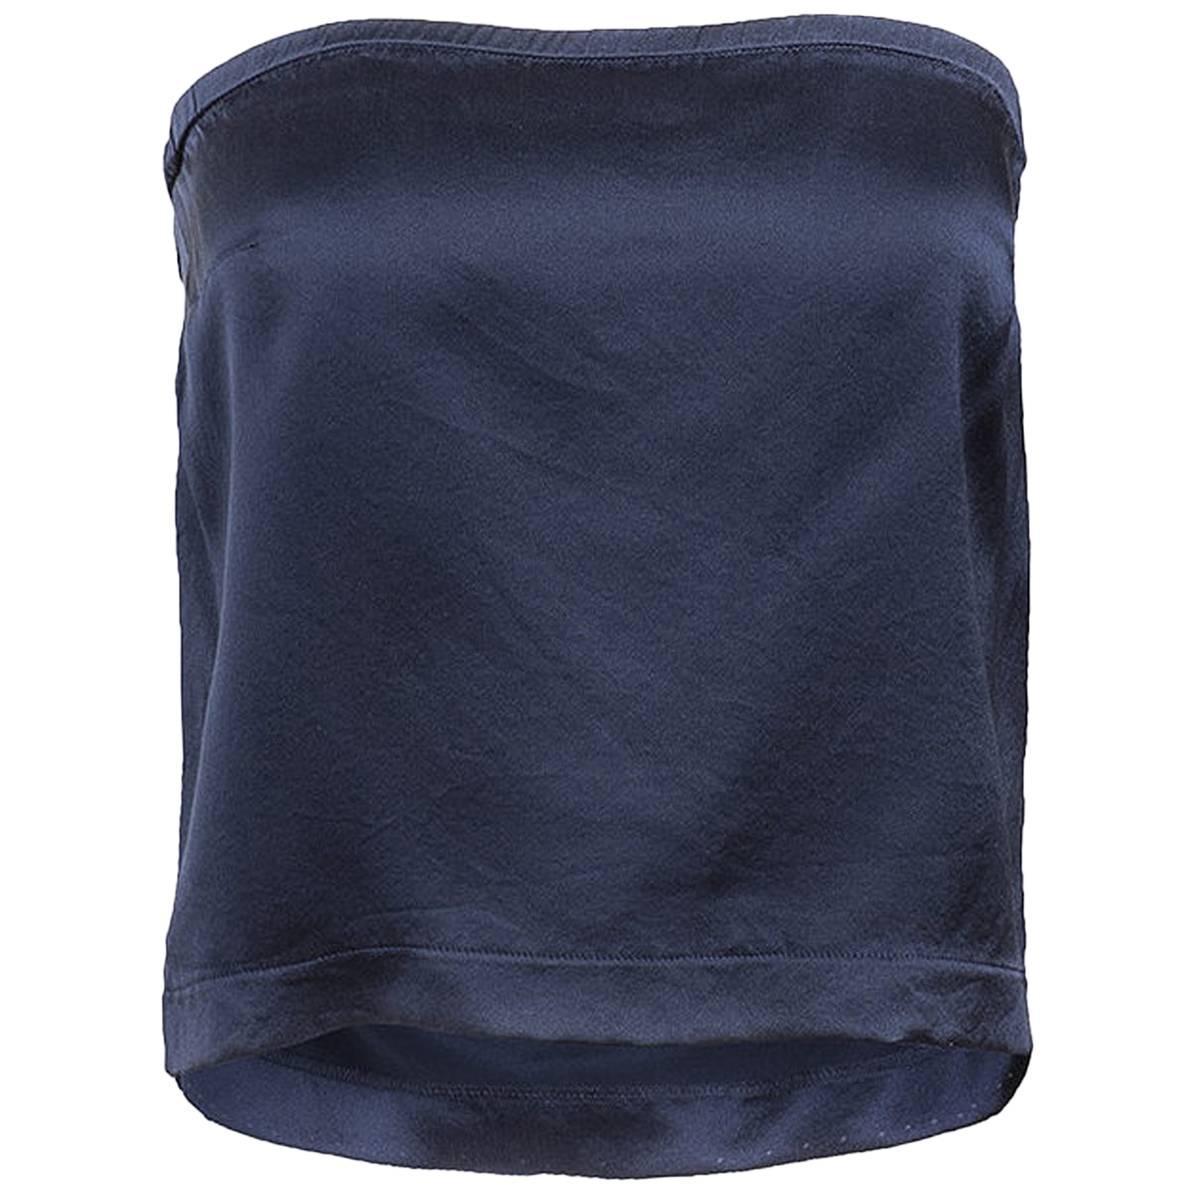 Maison Martin Margiela Blue Silk Strapless Top